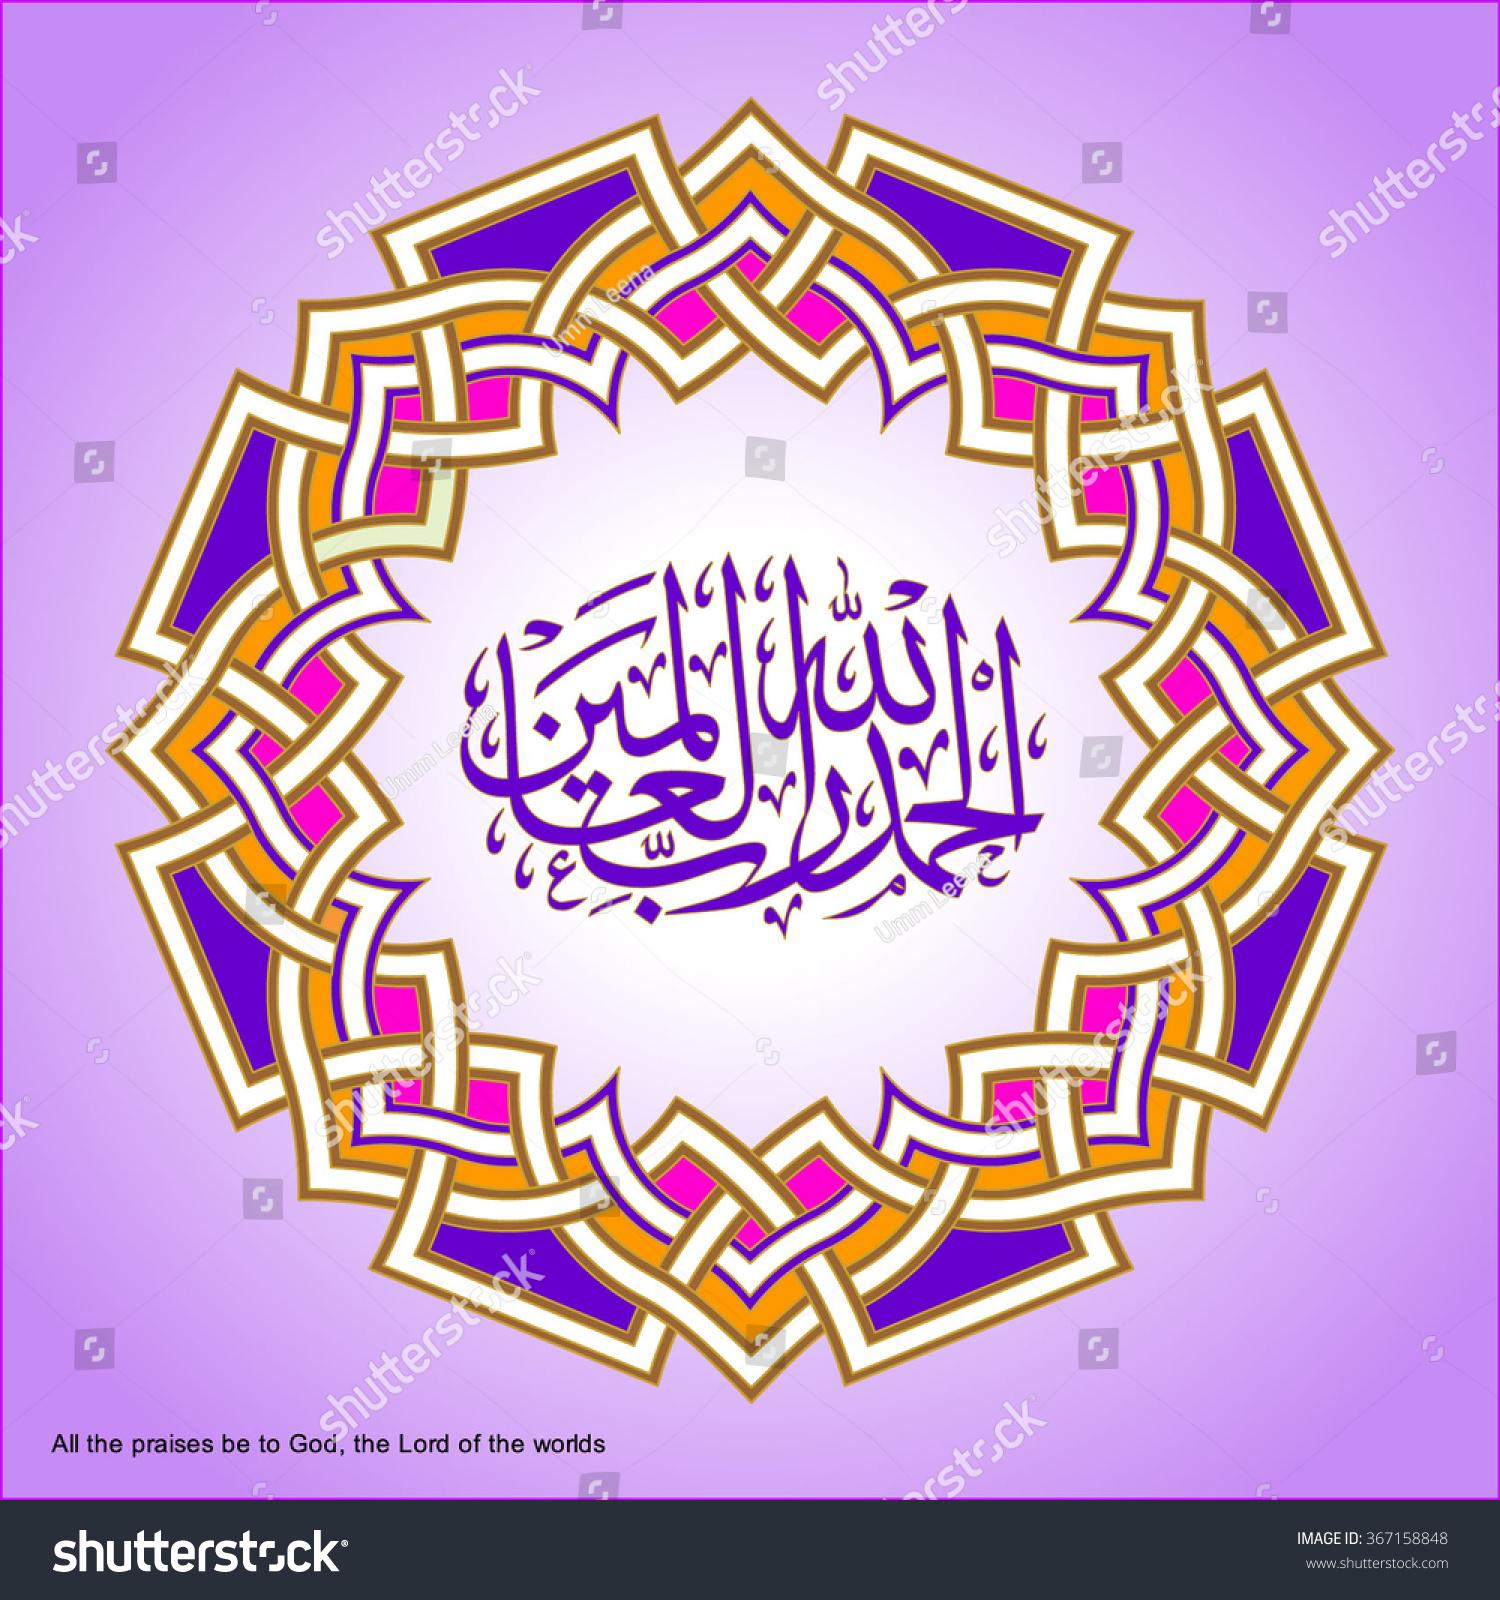 Royalty-free Arabic Islamic calligraphy violet pattern